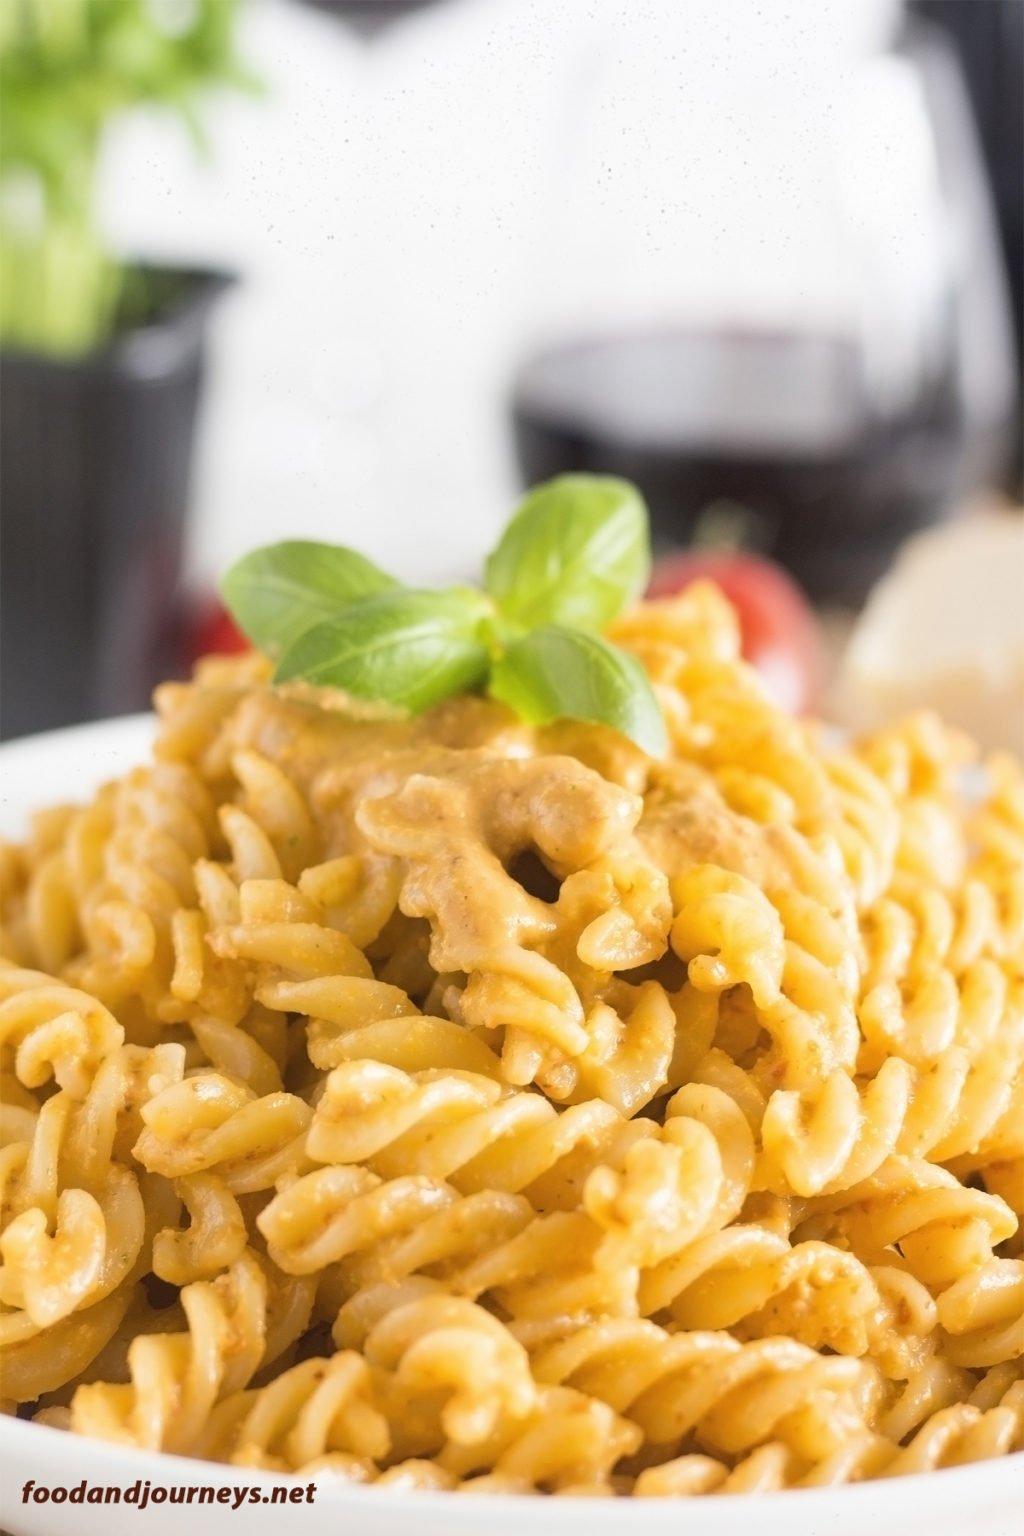 Fusilli with Pesto Trapanese pic1|foodandjourneys.net